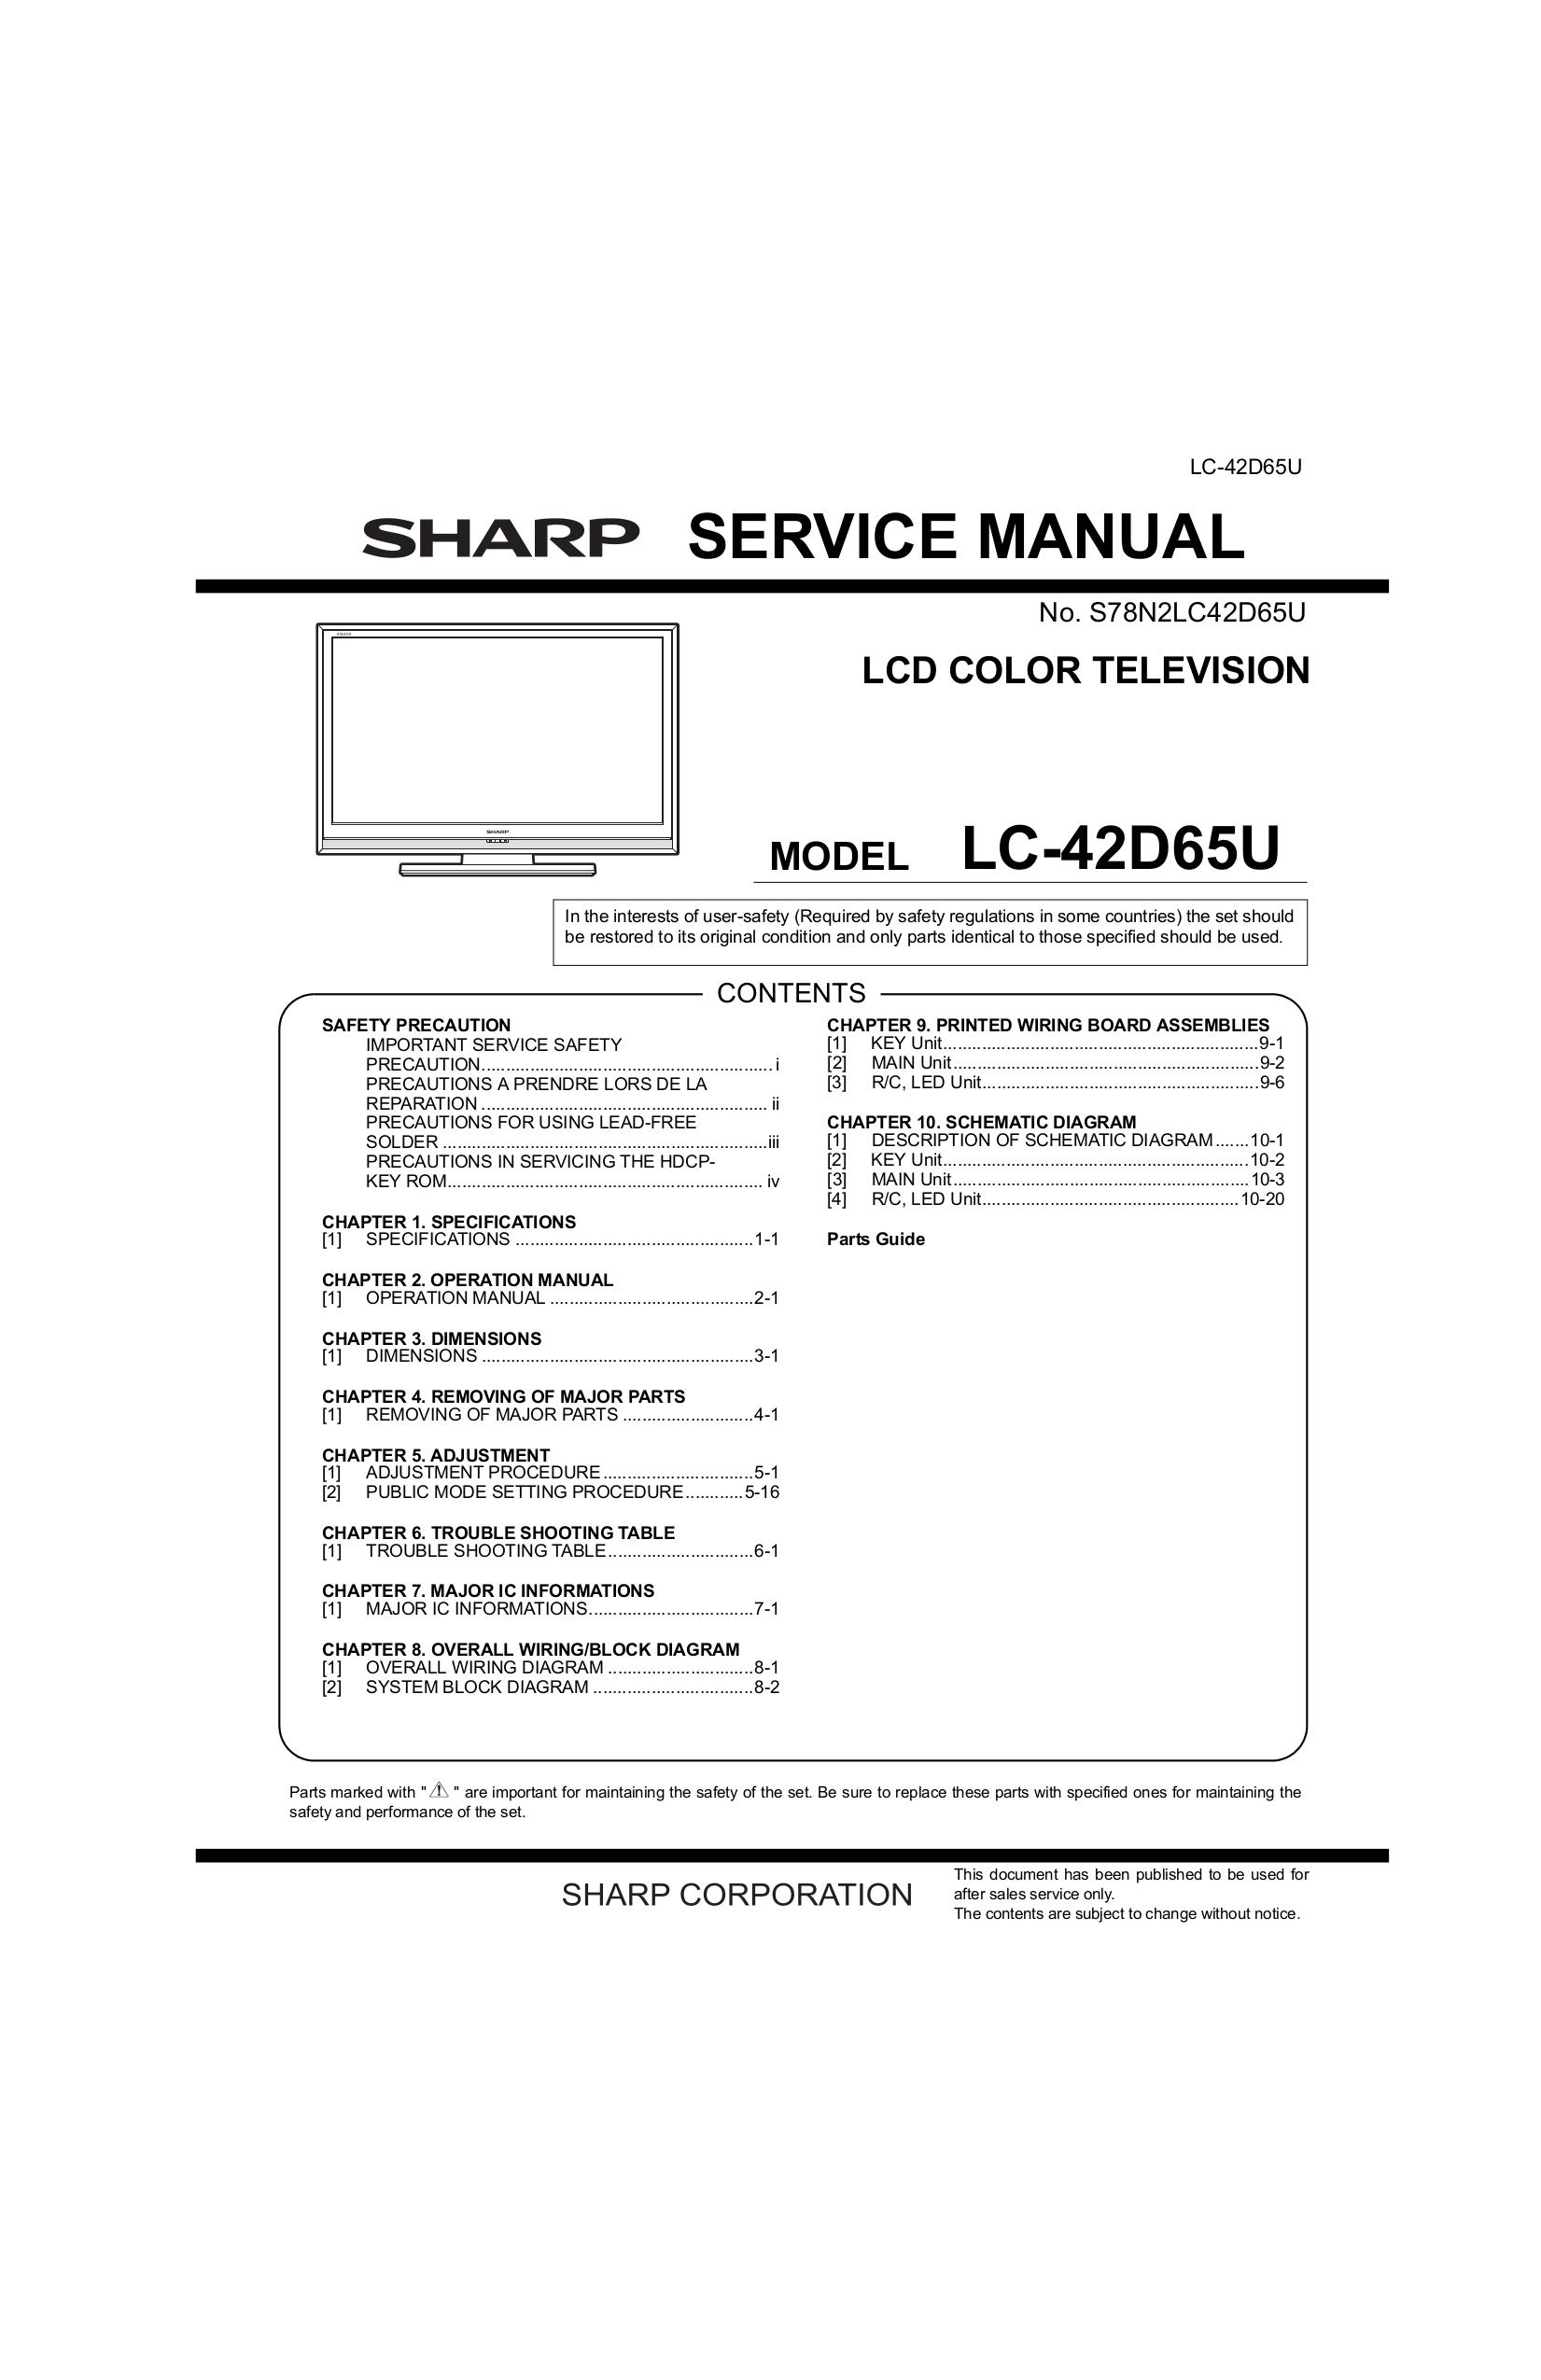 download free pdf for sharp aquos lc 42d65u tv manual rh umlib com sharp aquos lc42d65u manual sharp tv lc-42d65u manual